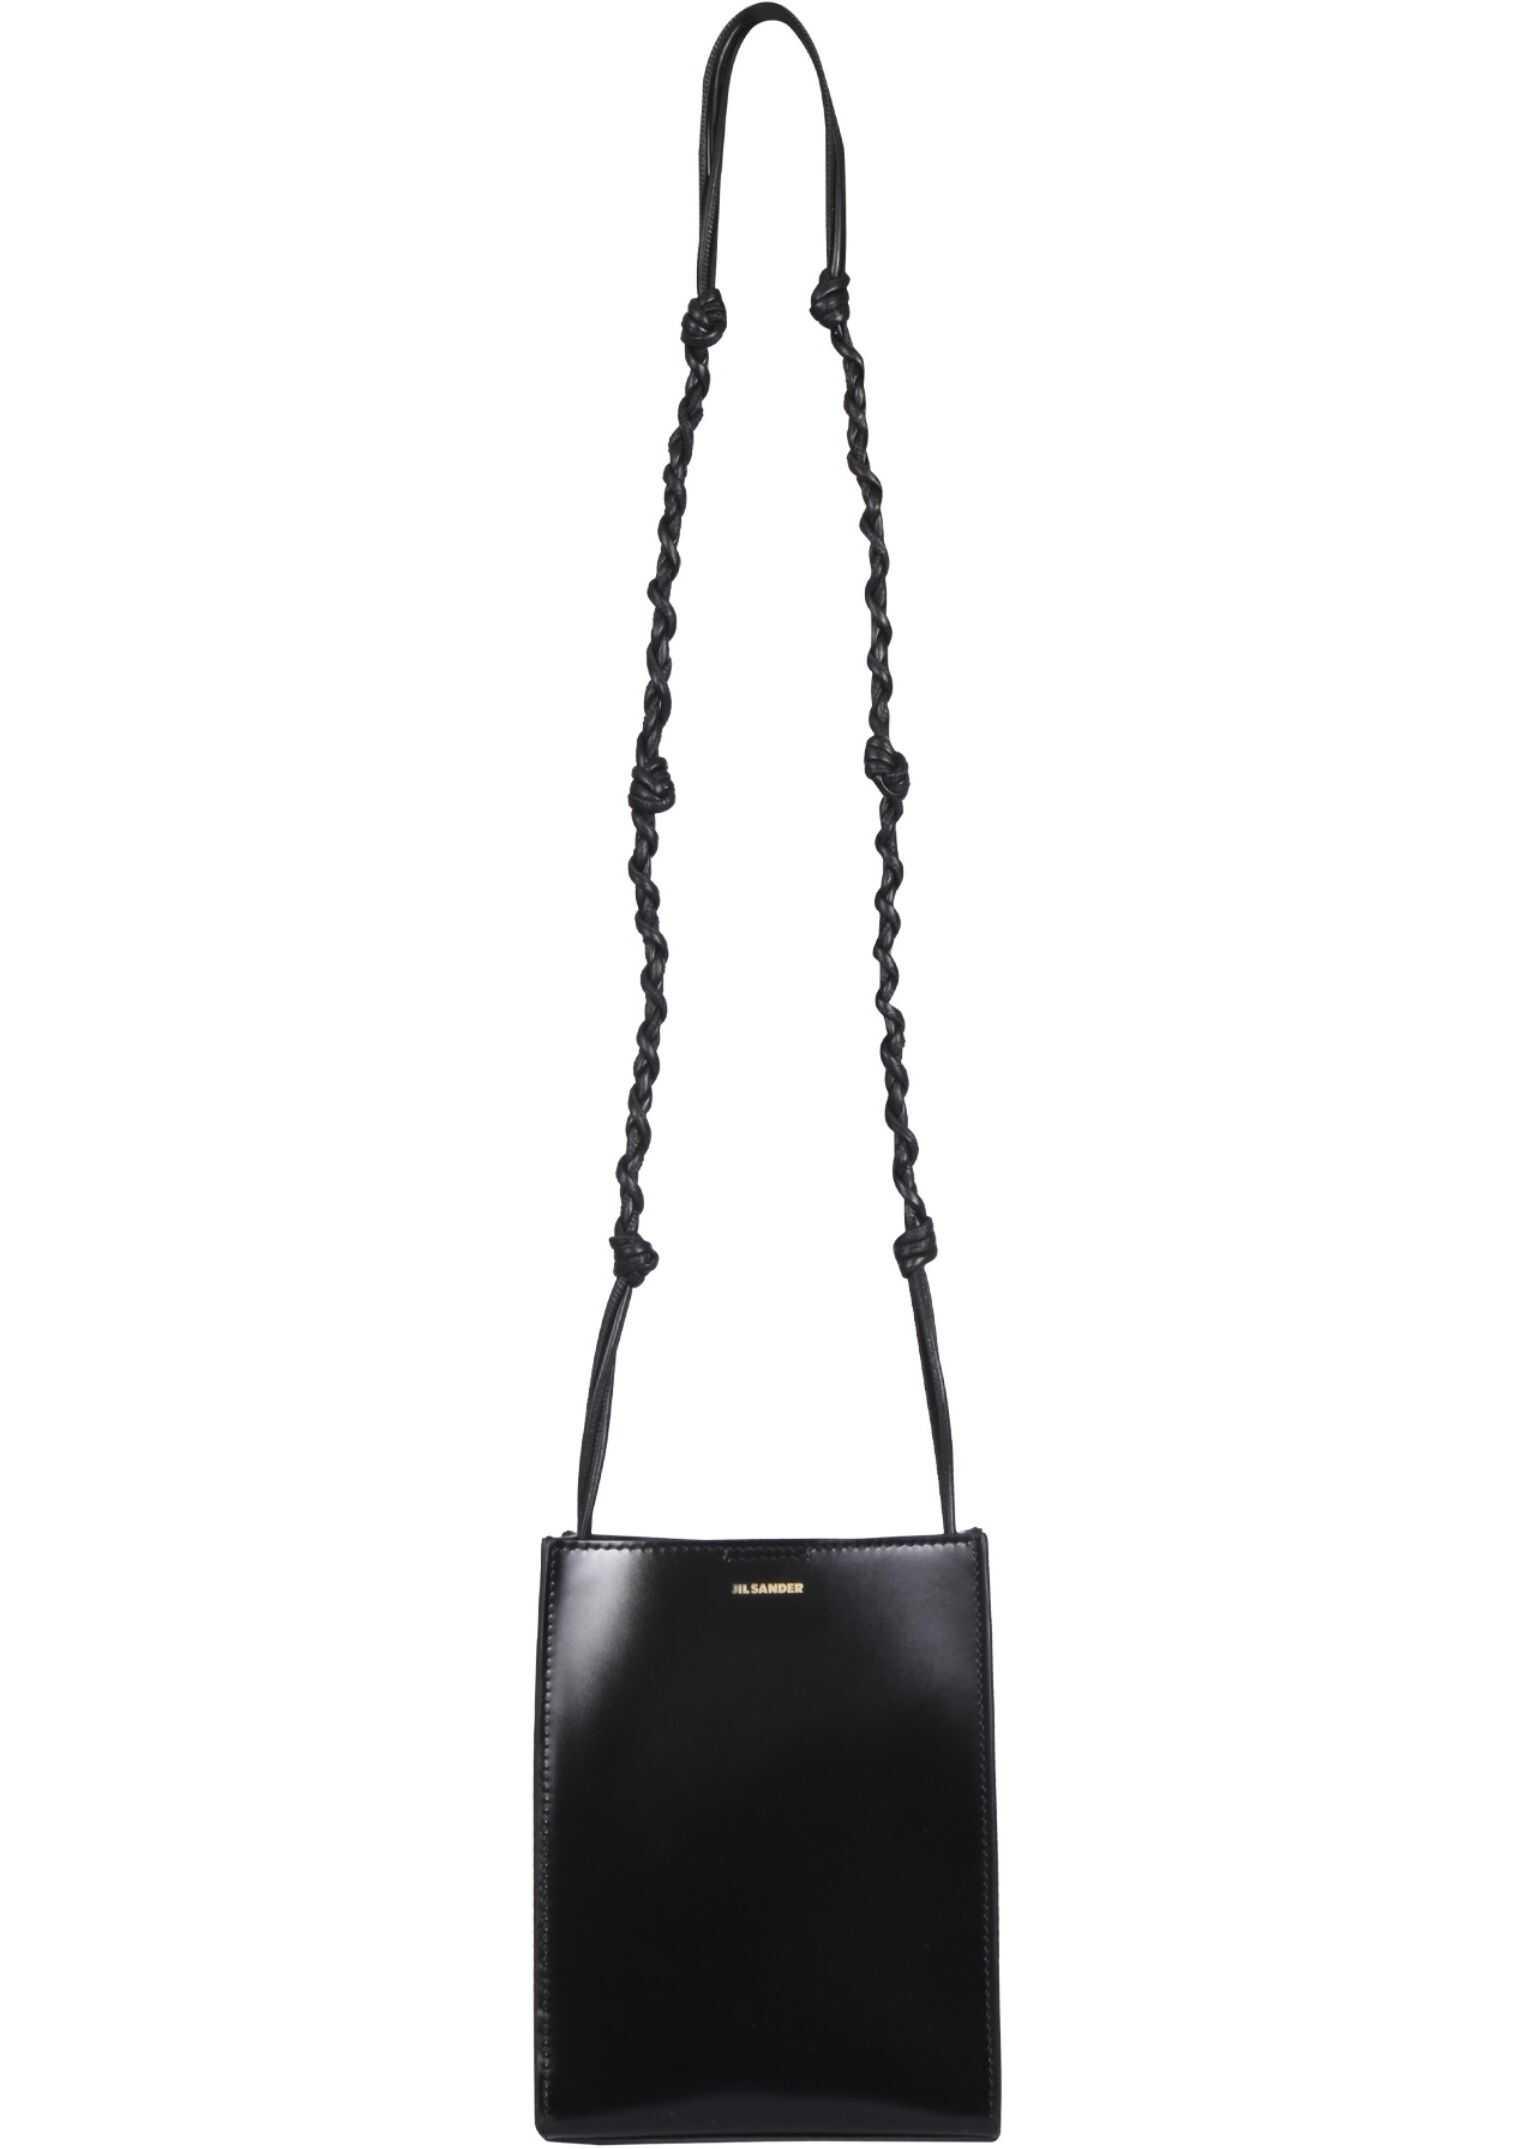 Jil Sander Small Tangle Bag JSWS853173_WSB69158N001 BLACK imagine b-mall.ro